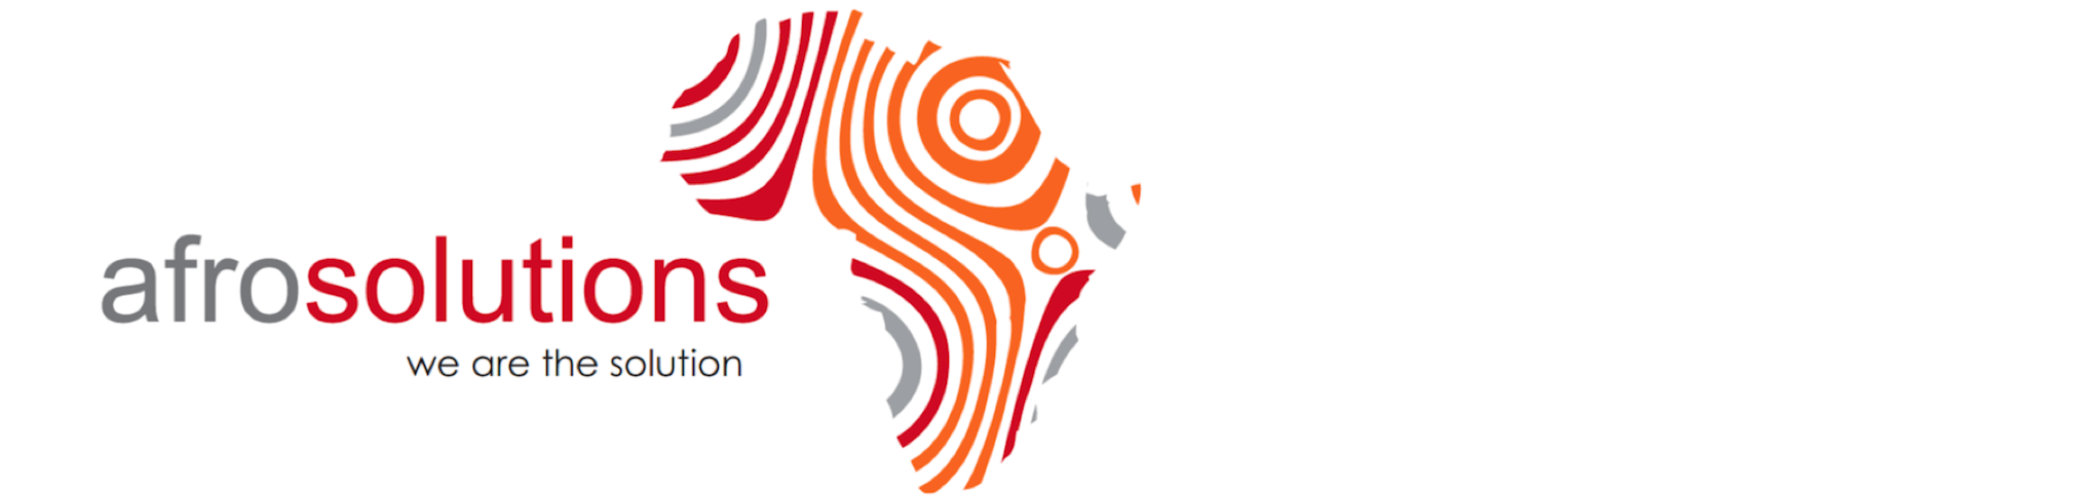 Afrosolutions Pty Ltd